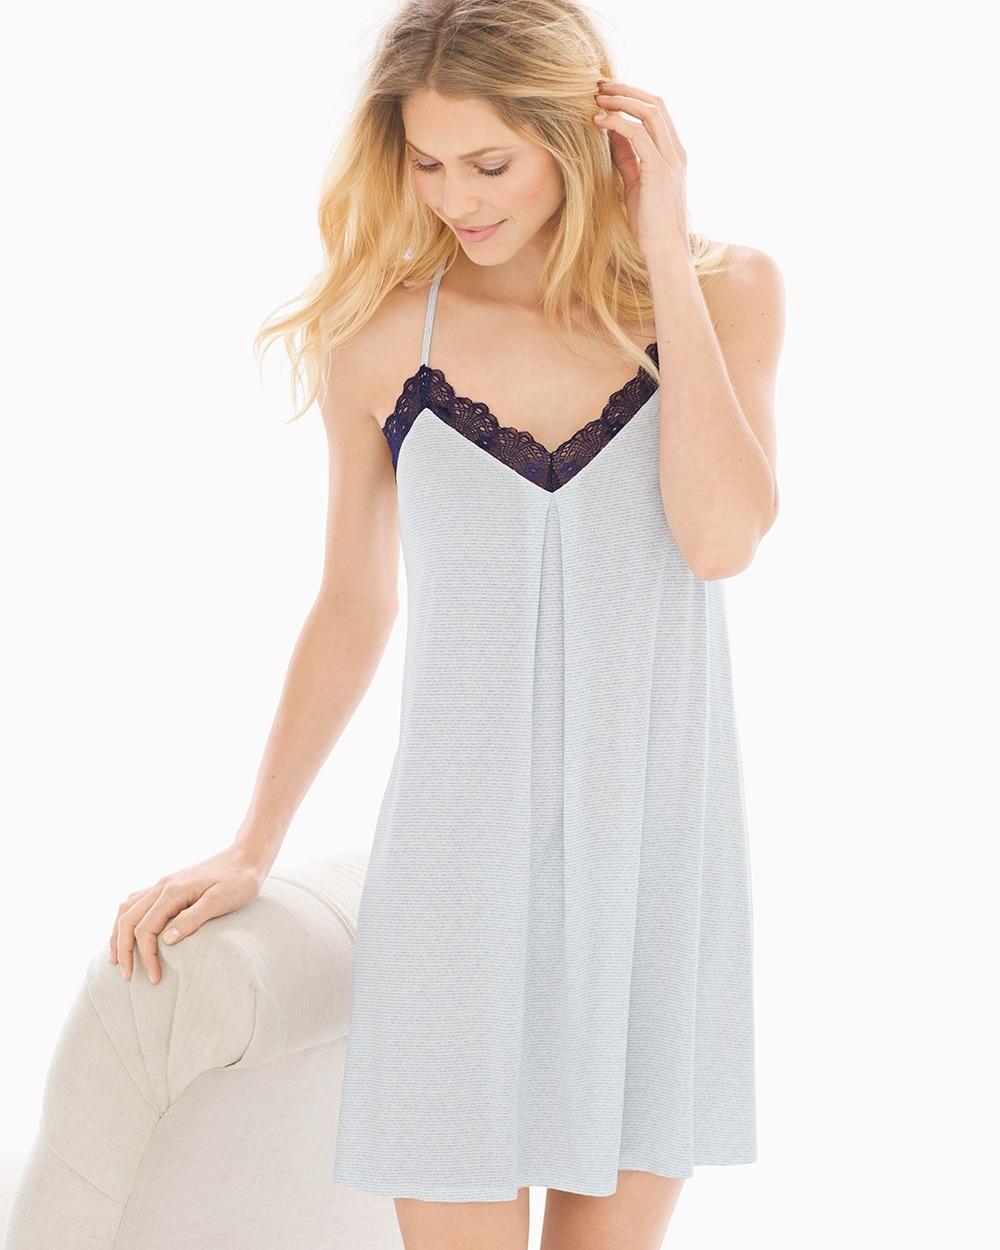 74ce8814c Cool Nights Lace Trim Sleep Chemise Zen Stripe Pale Blue - Soma